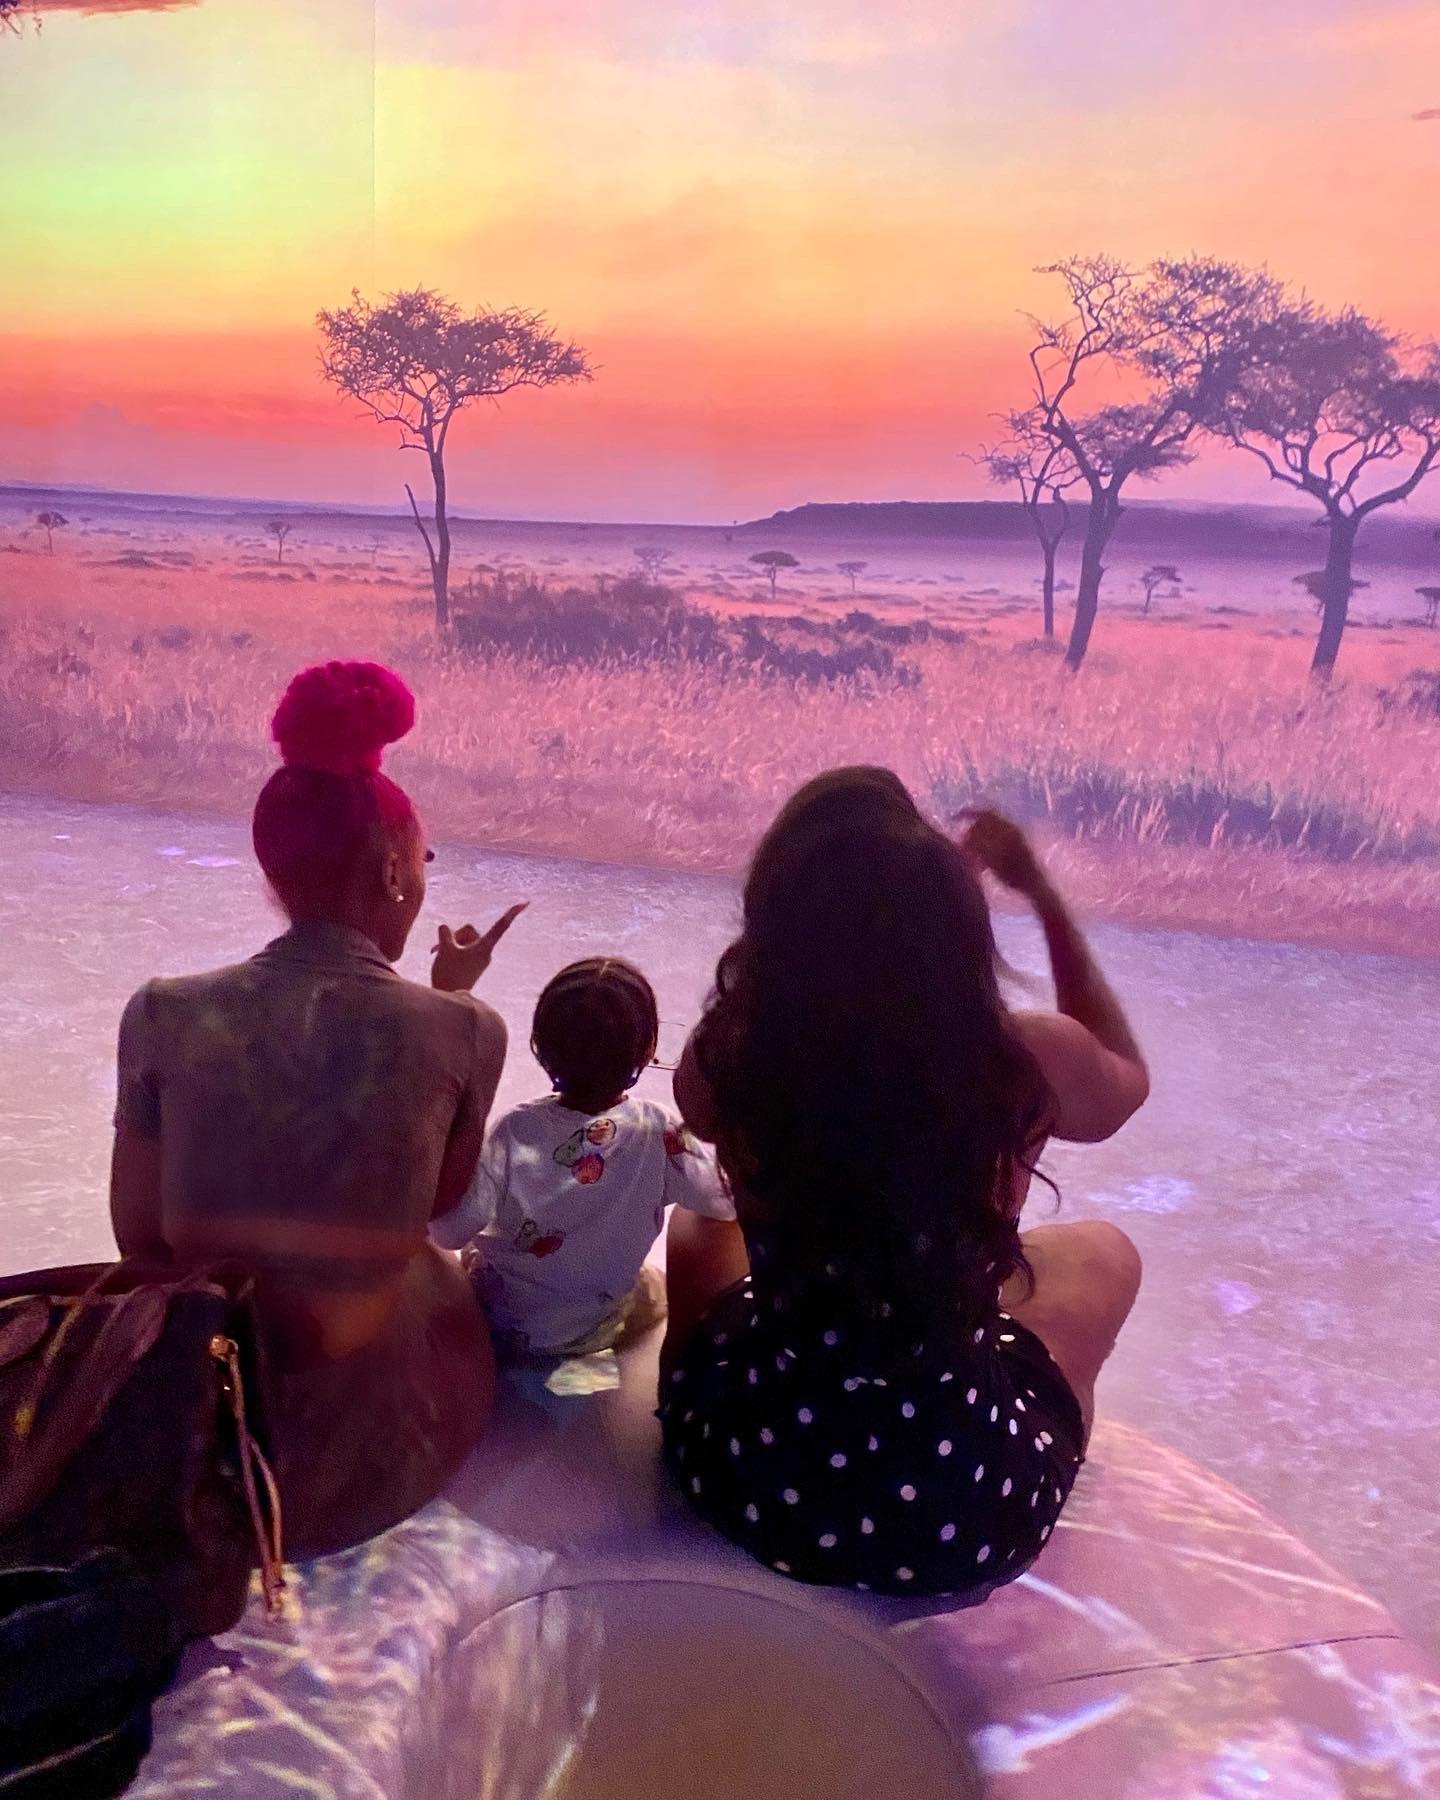 Illuminarium Atlanta, A Wild Safari Experience For The Whole Family